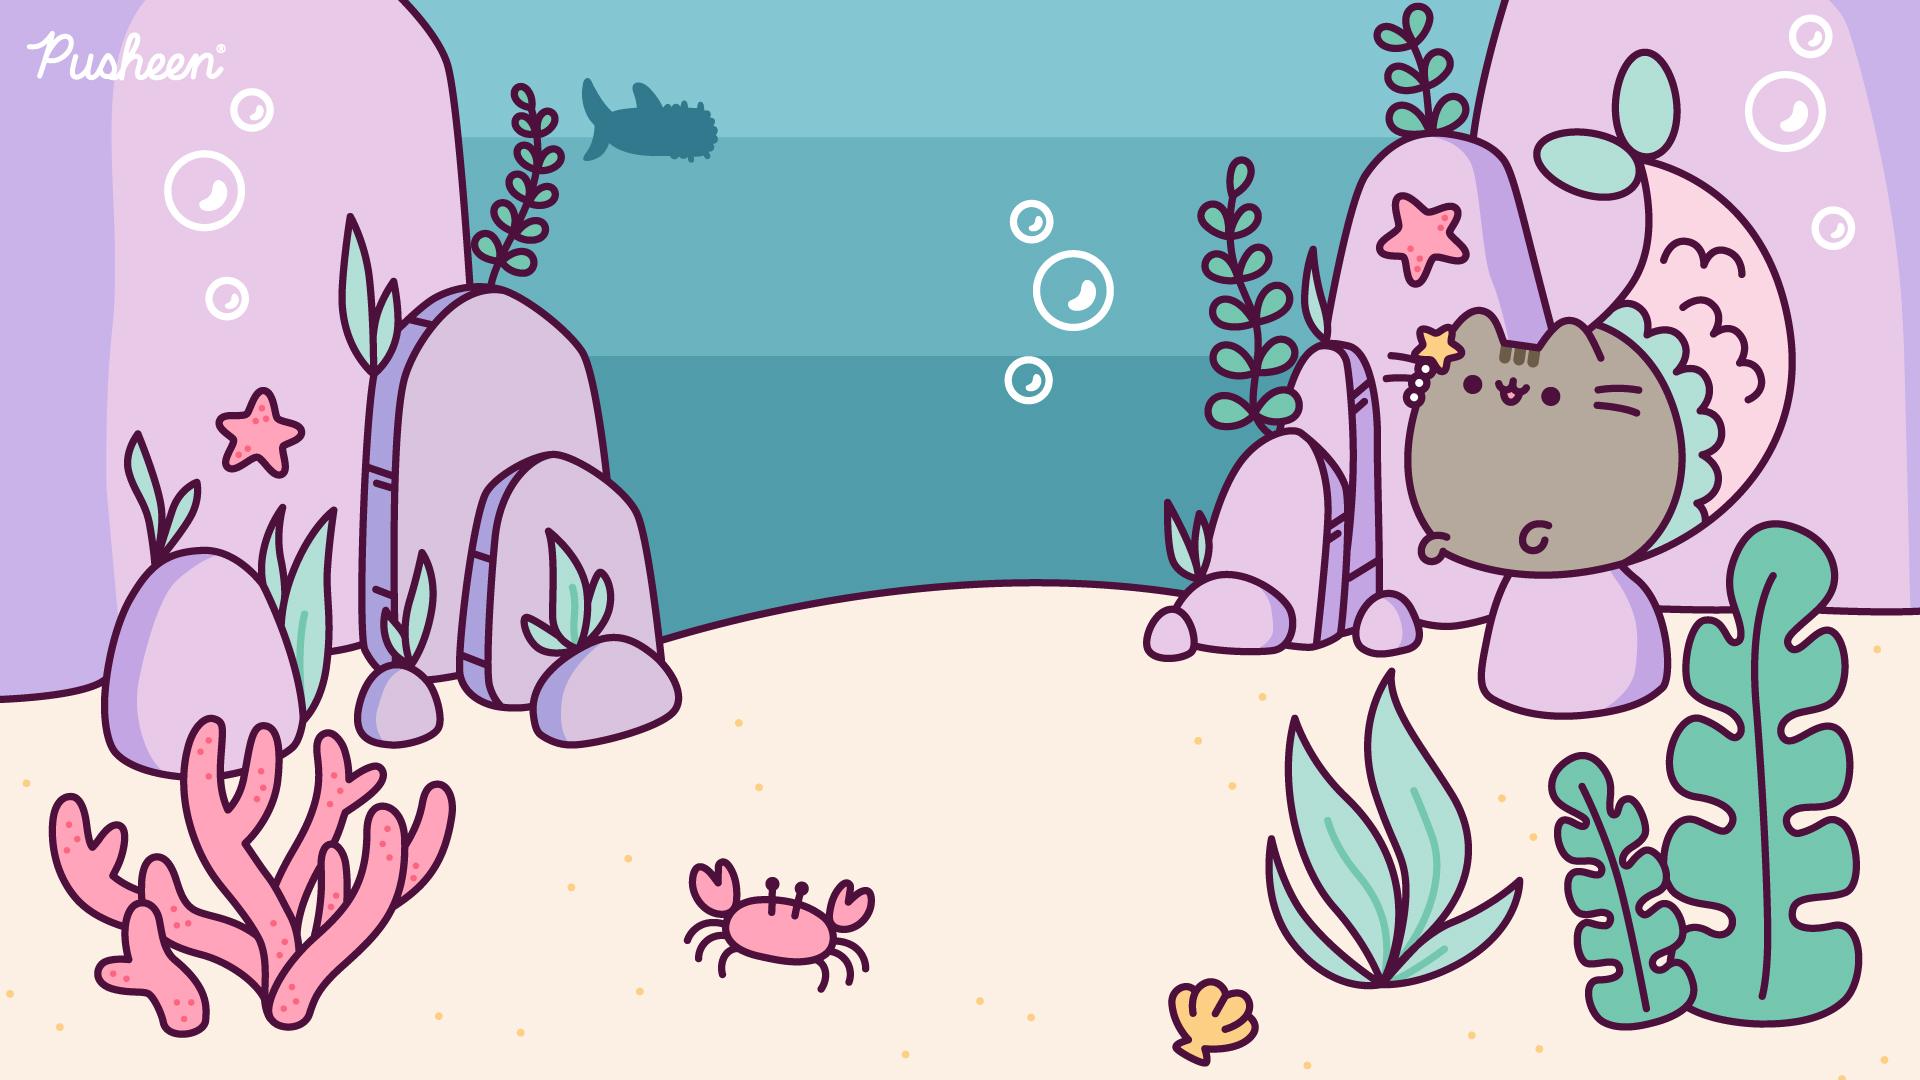 Pusheen_Zoom_Background_Mermaid_2020